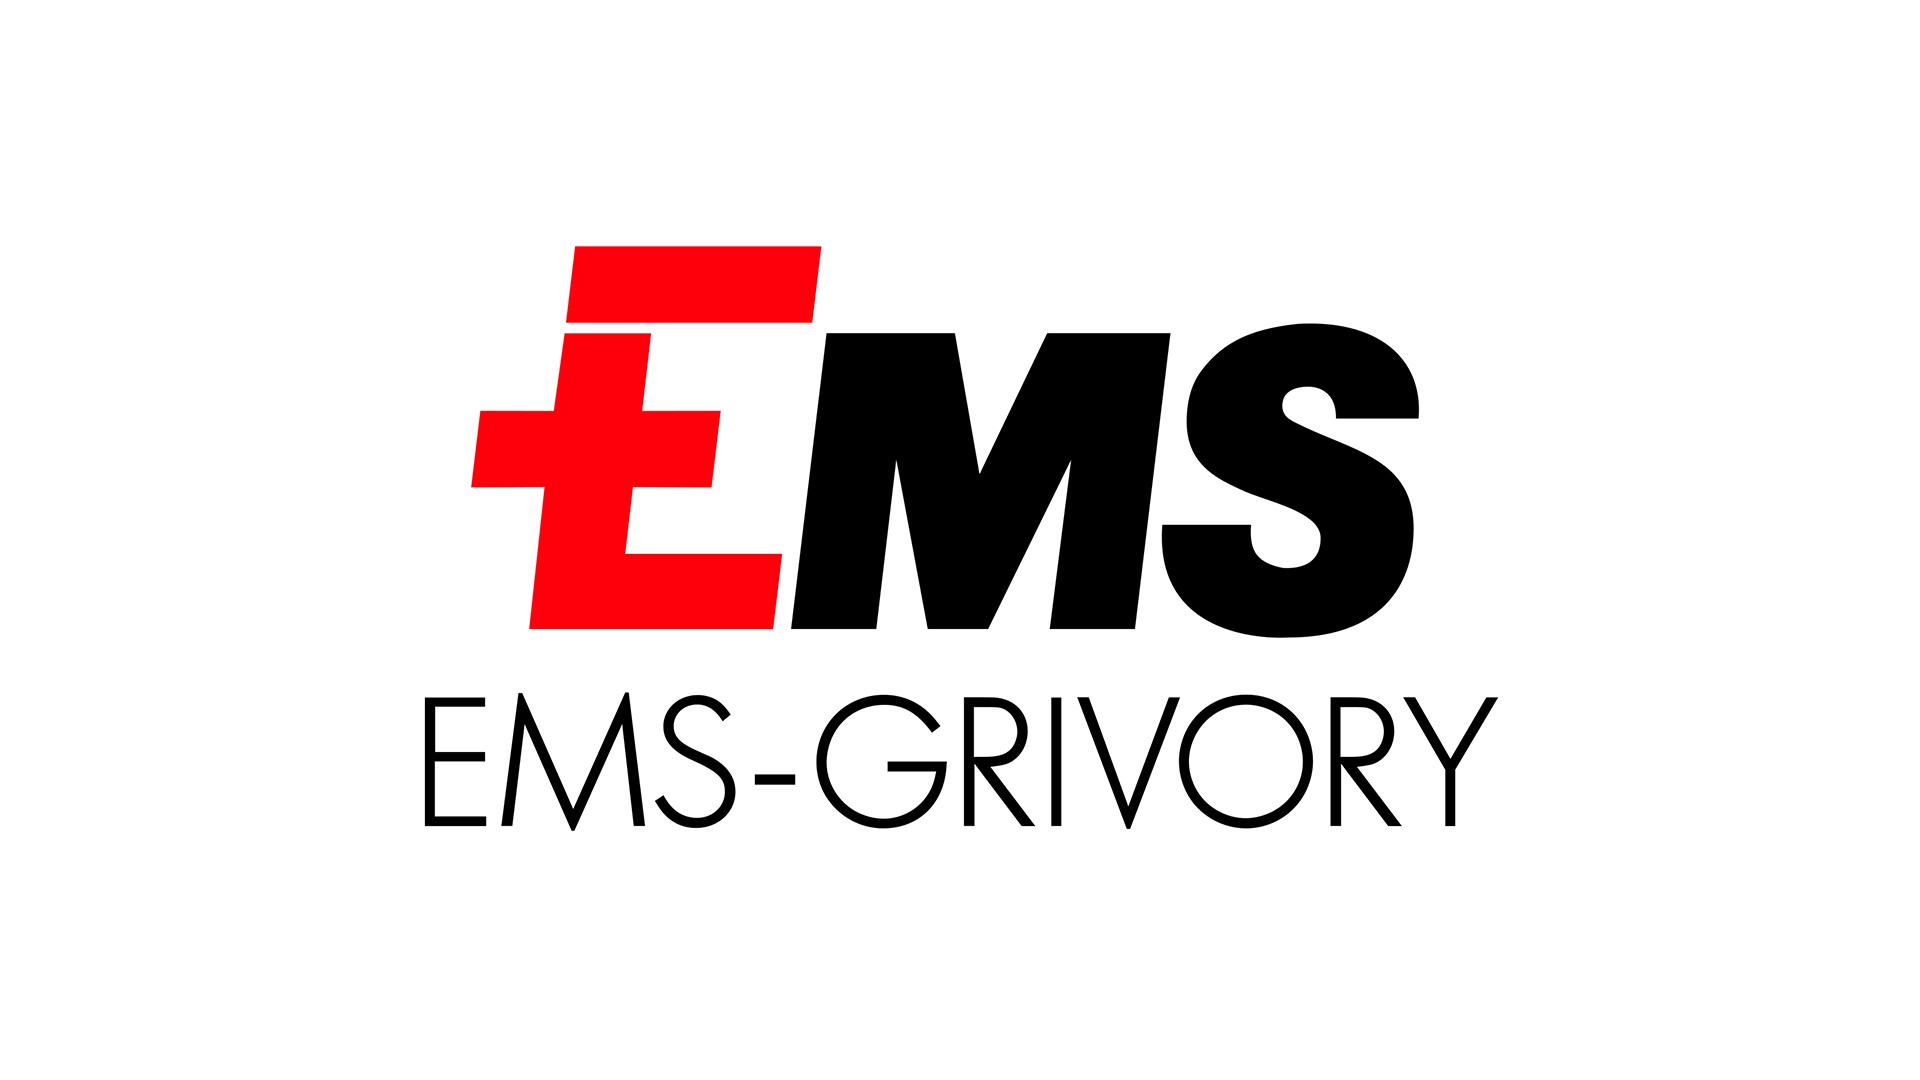 EMS-GRIVORY